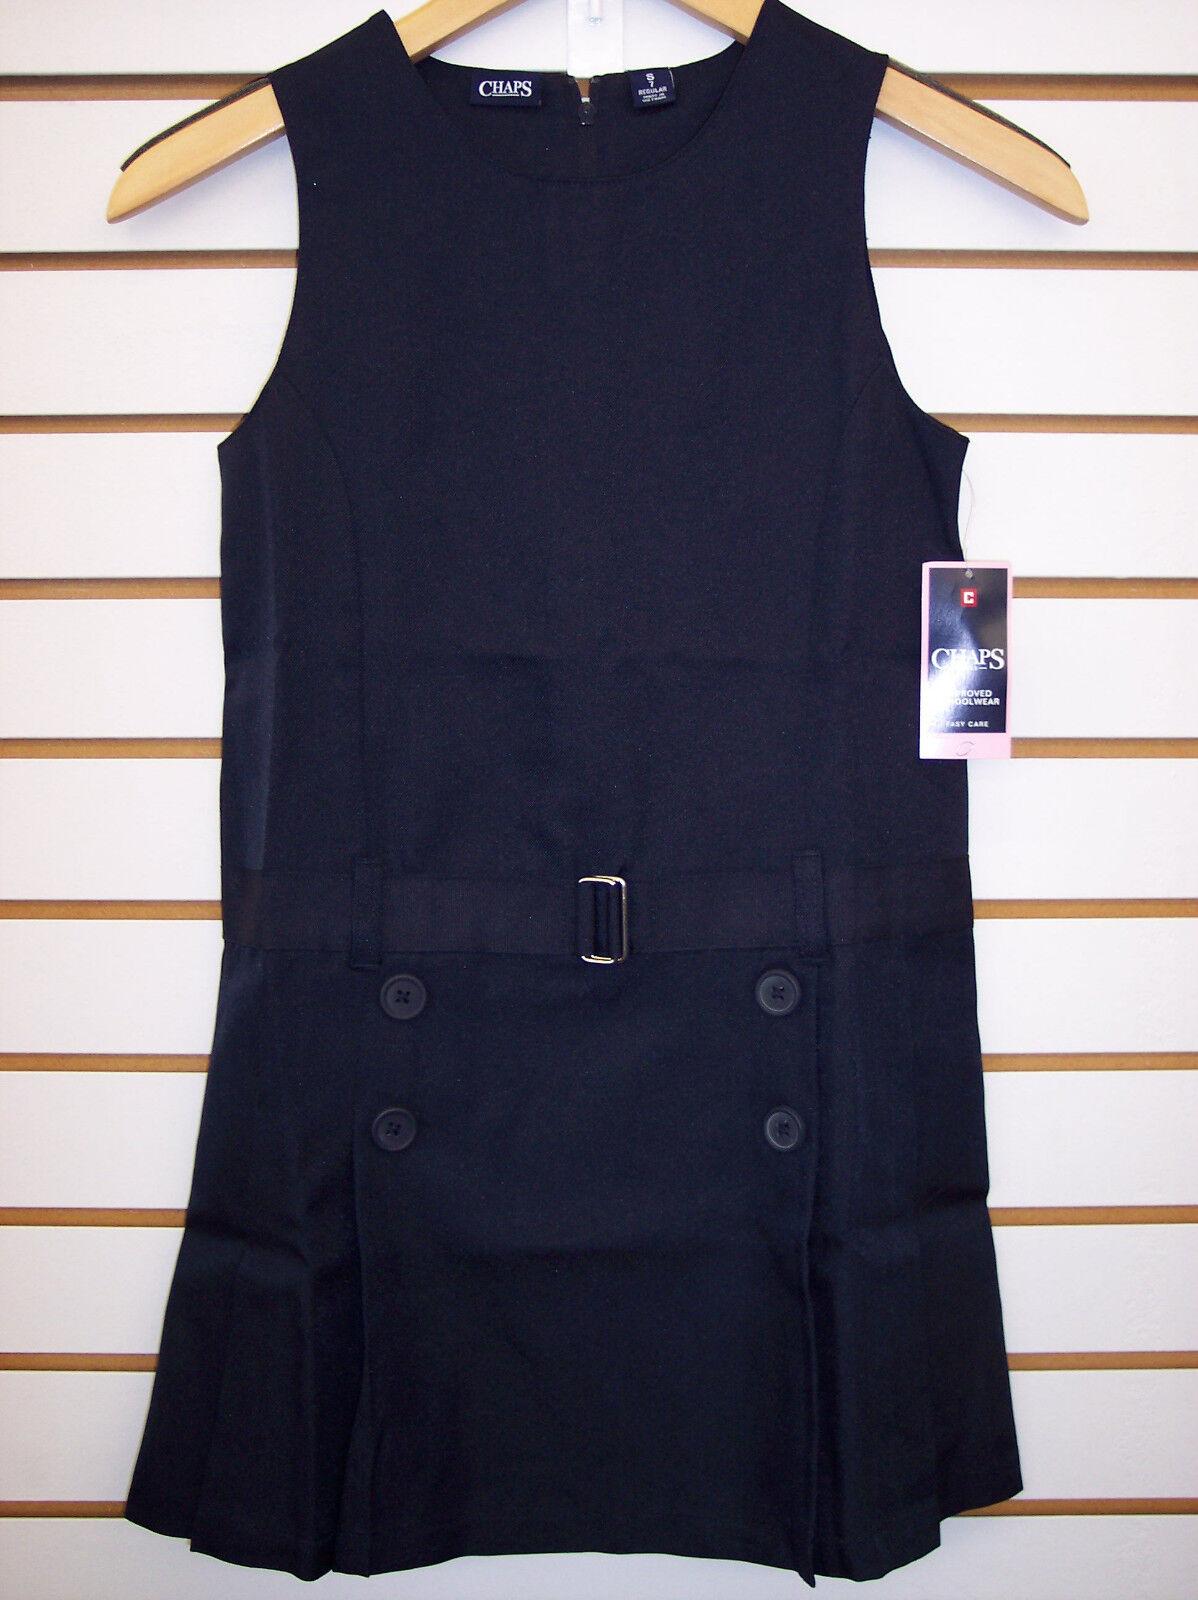 Girls $28.00 Chaps Navy or Khaki Uniform Jumper Dress Size 7